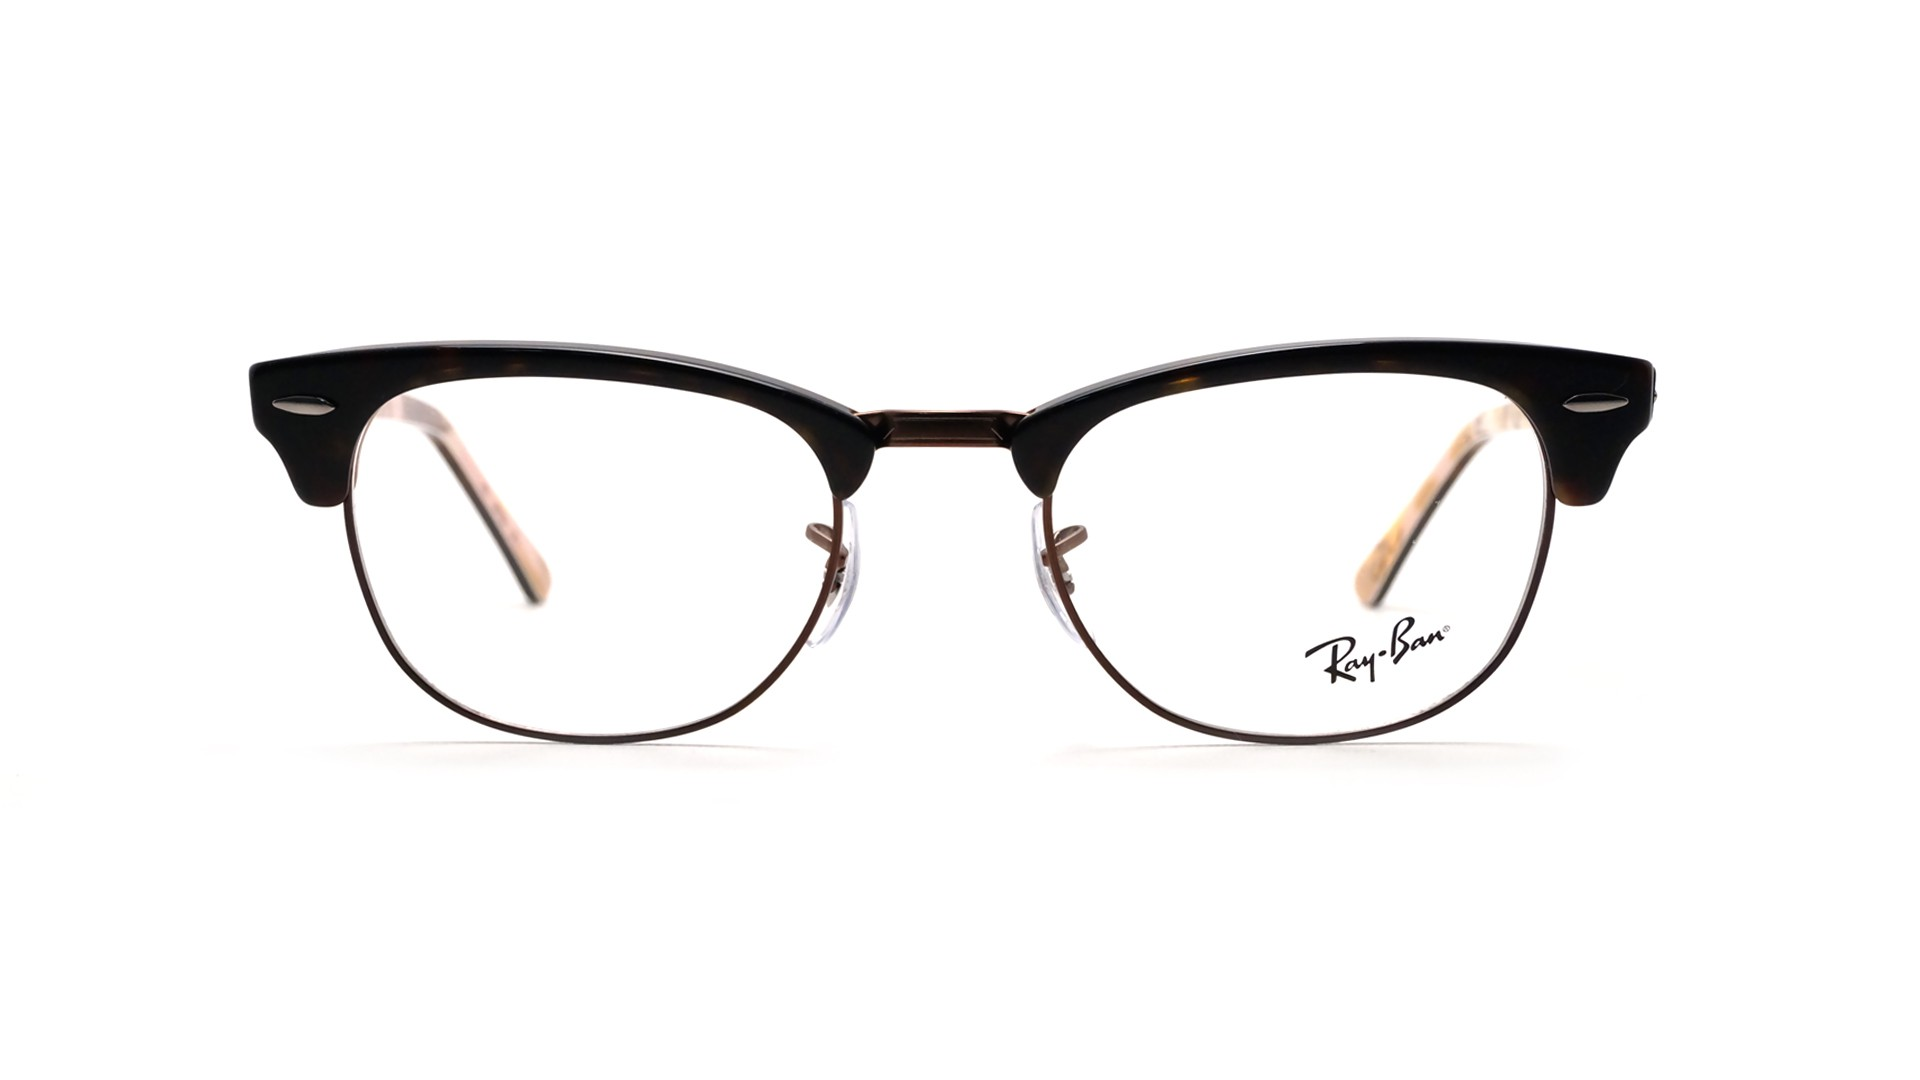 Eyeglasses Ray Ban Clubmaster Tortoise Rx5154 Rb5154 5650